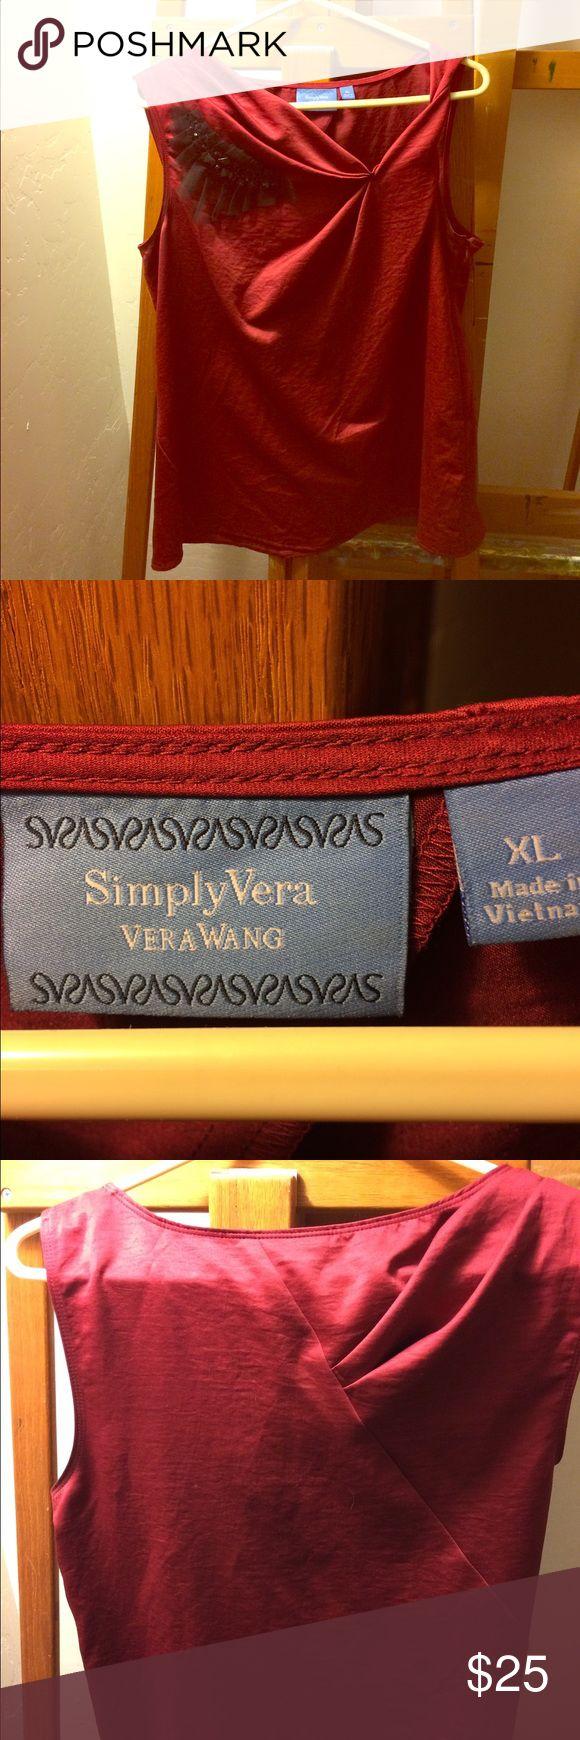 Vera Wang Simply Vera Top. Ruby with Black Accent Vera Wang Simply Vera. Ruby top with Black accent. Beautiful details. Size XL. Vera Wang Tops Camisoles